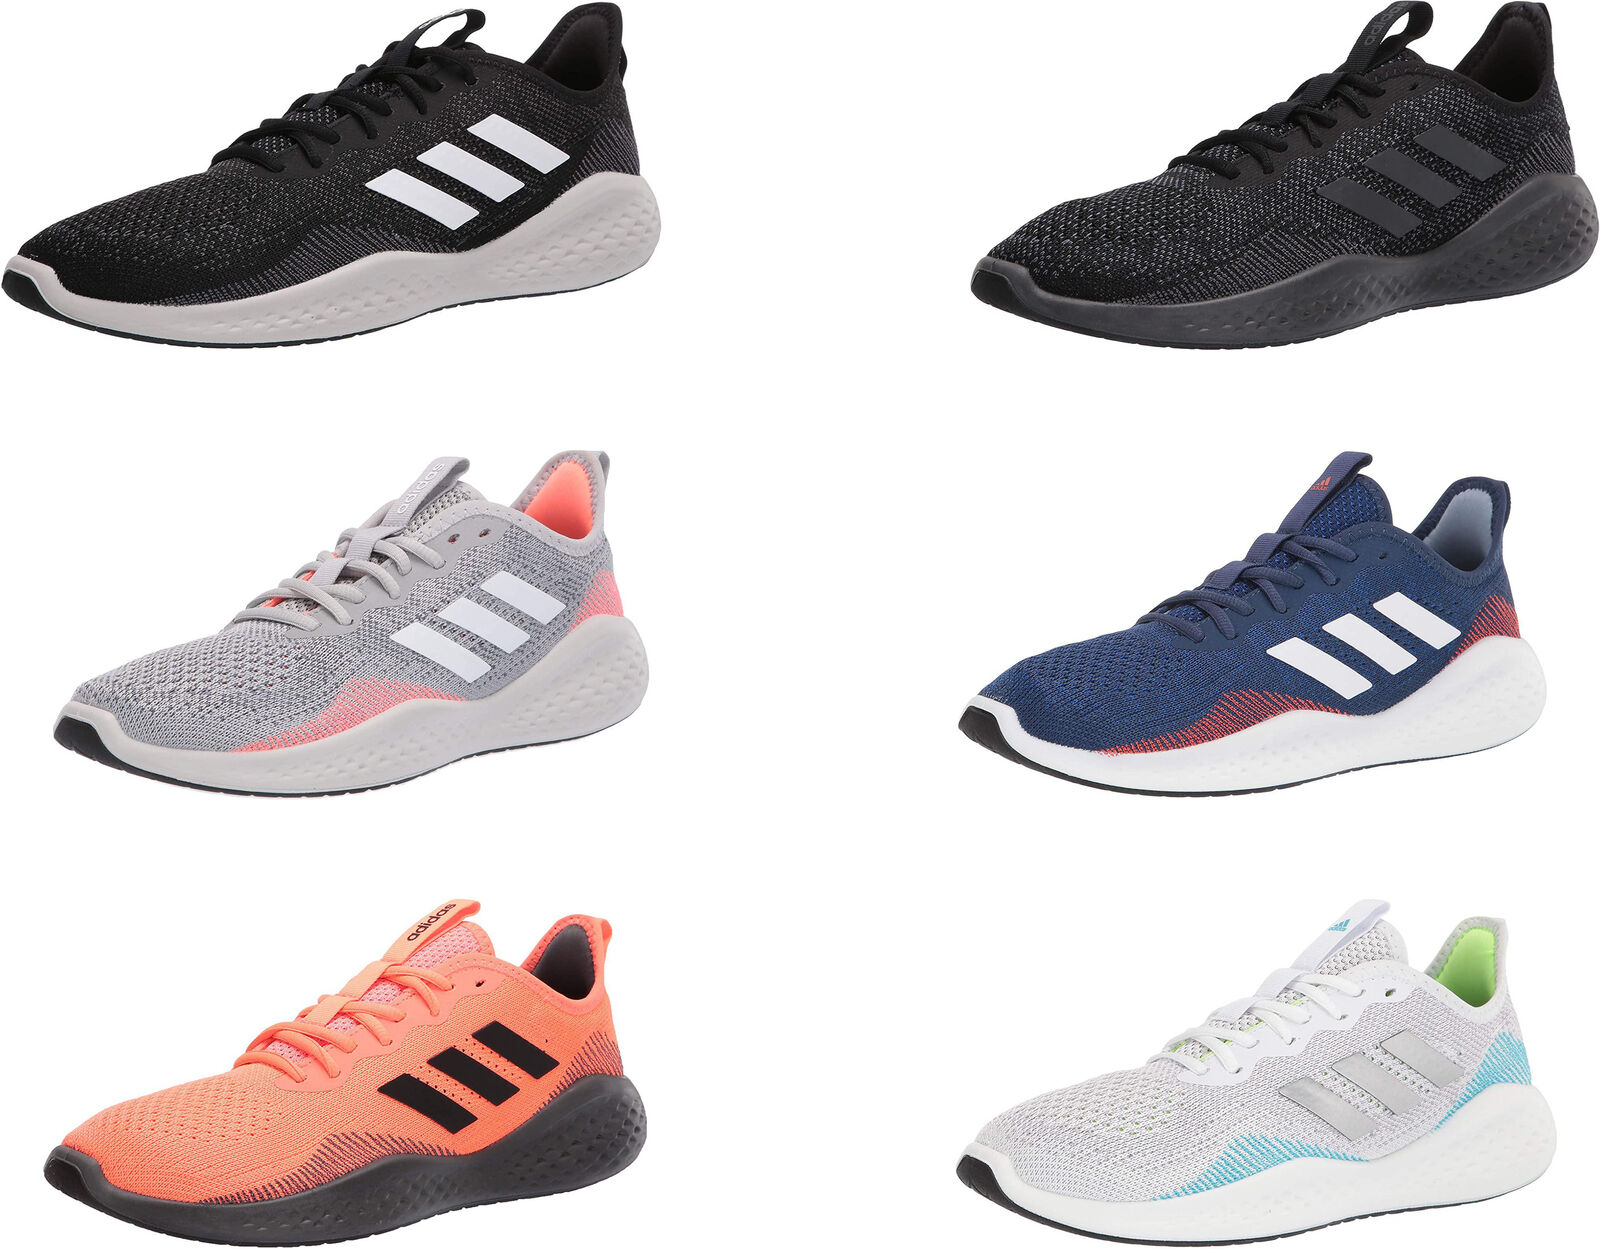 adidas Men's Fluidflow Bounce Running Shoes | eBay